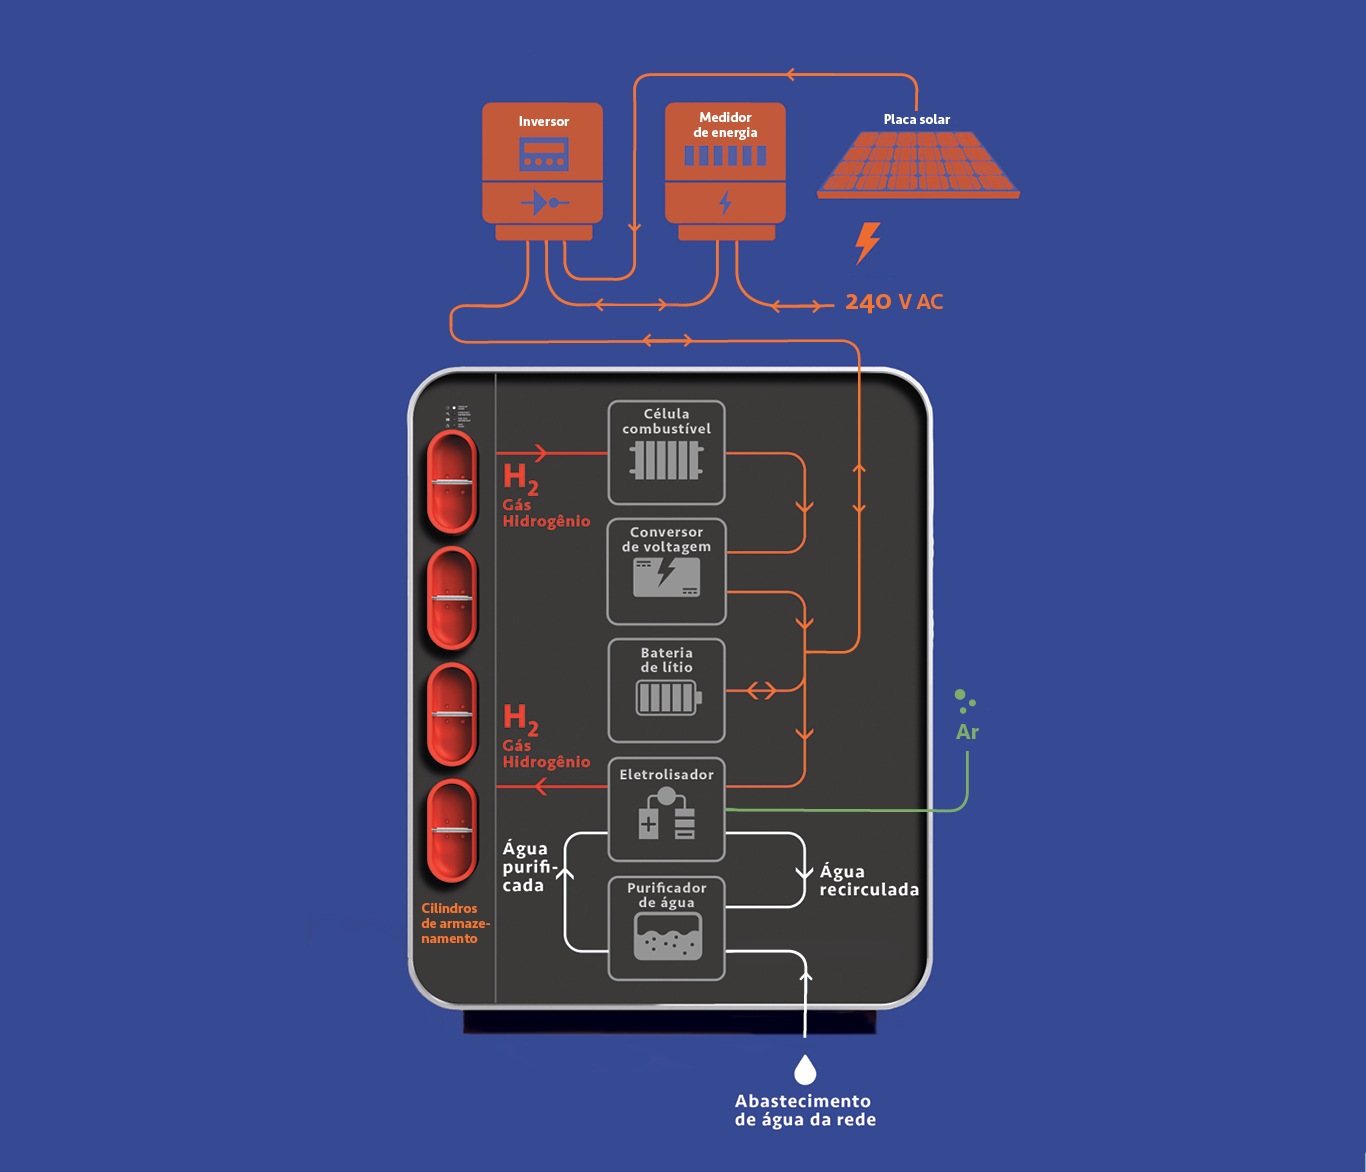 Diagrama mostrando o funcionamento da máquina LAVO